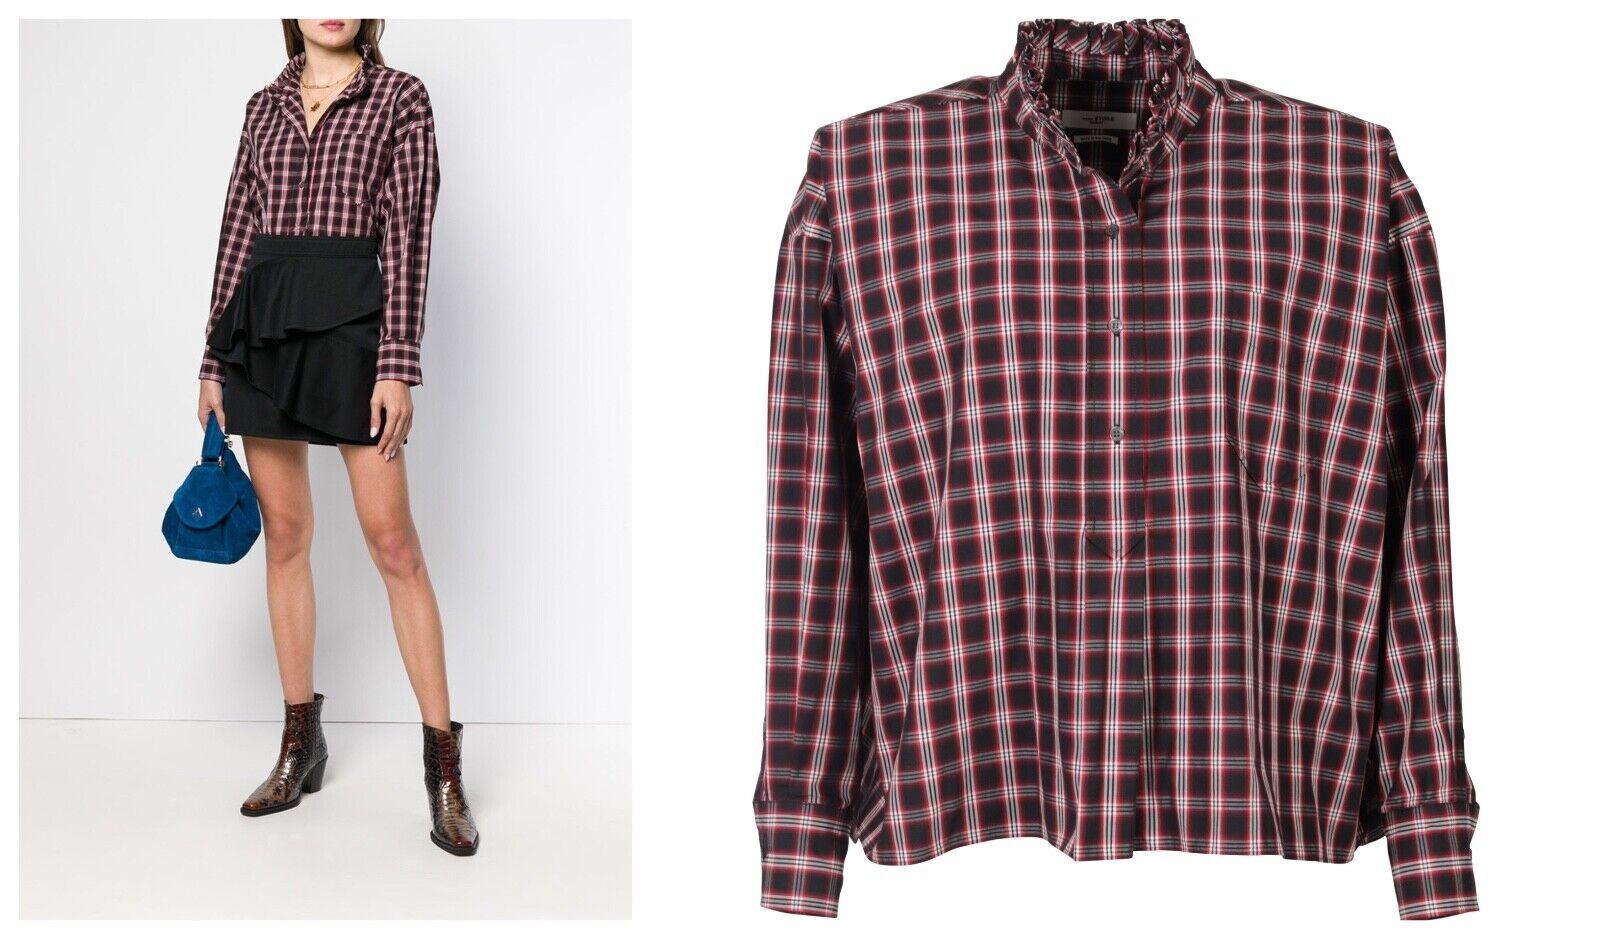 ISABEL MARANT Check Ruffle OverGrößed OLENA Shirt Blouse, FR 34